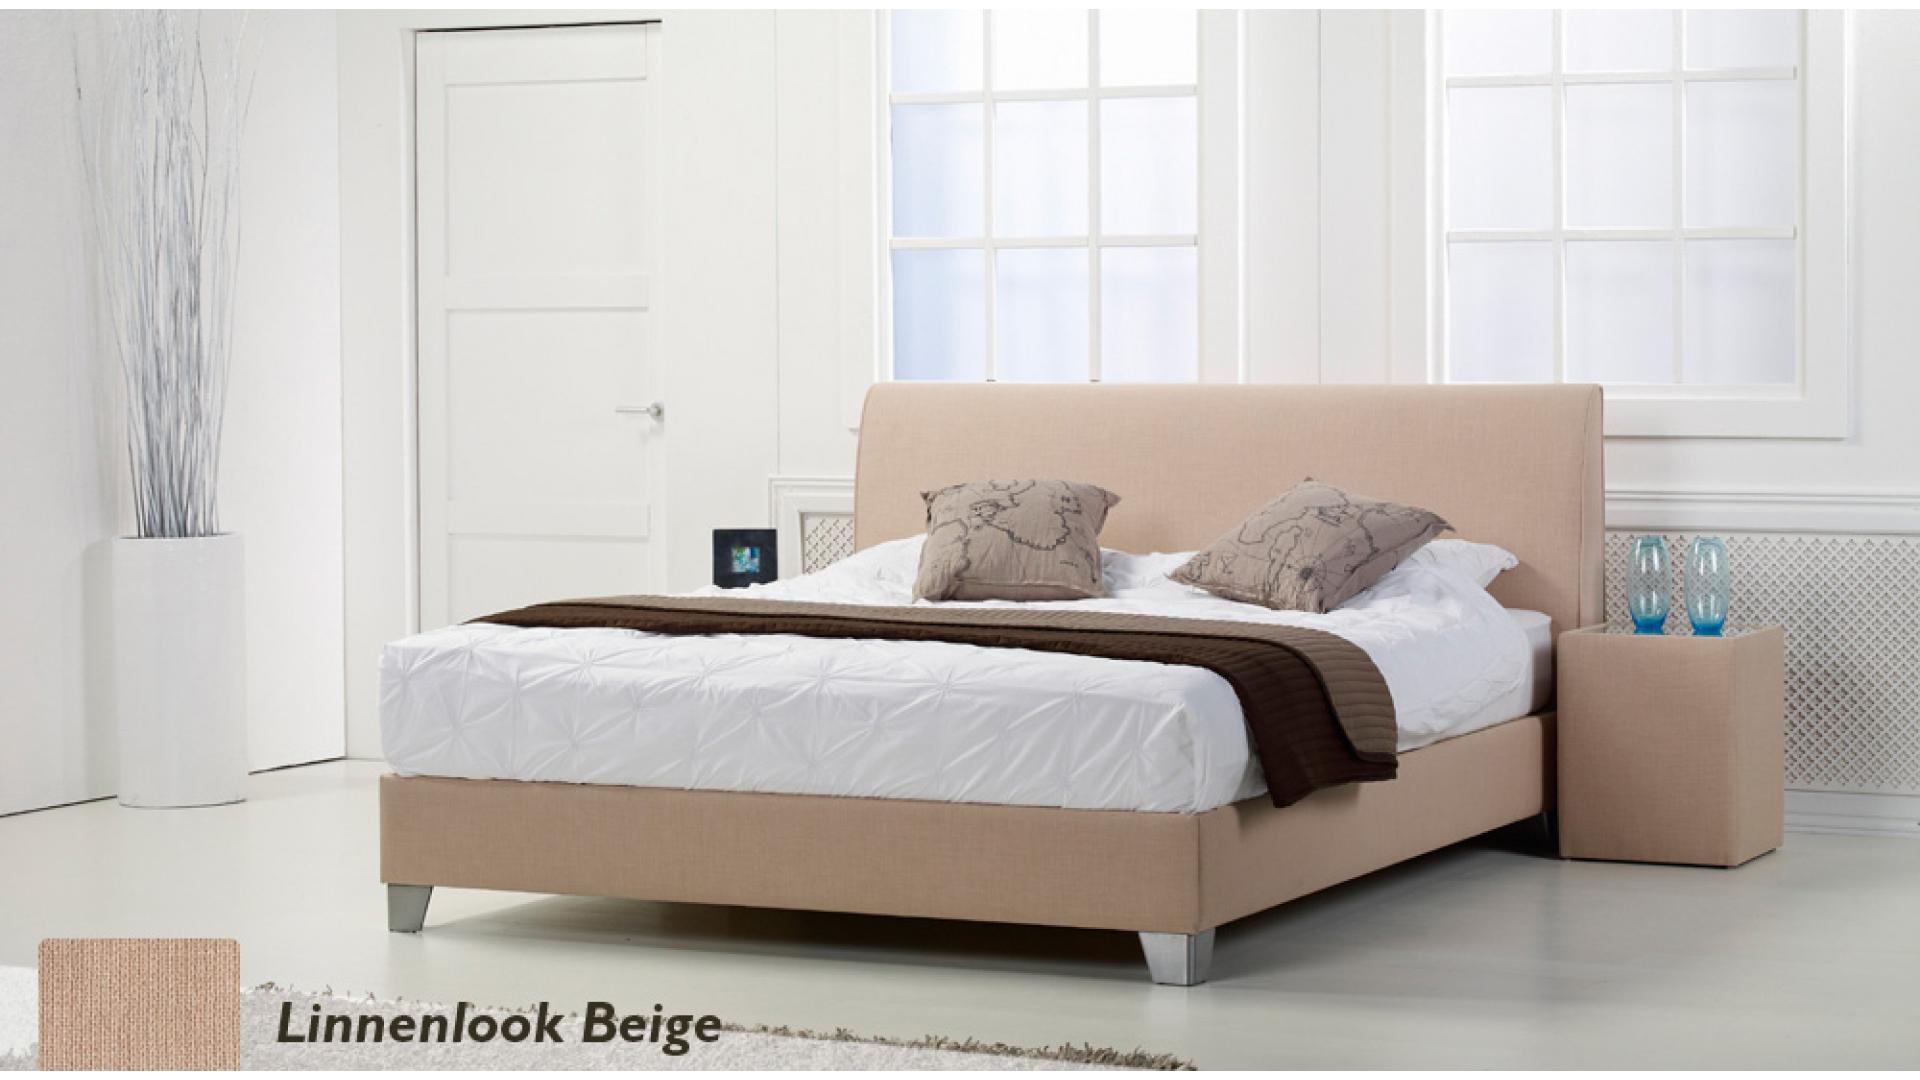 waterbed basic box pro linnenlook beigeboxspring-look